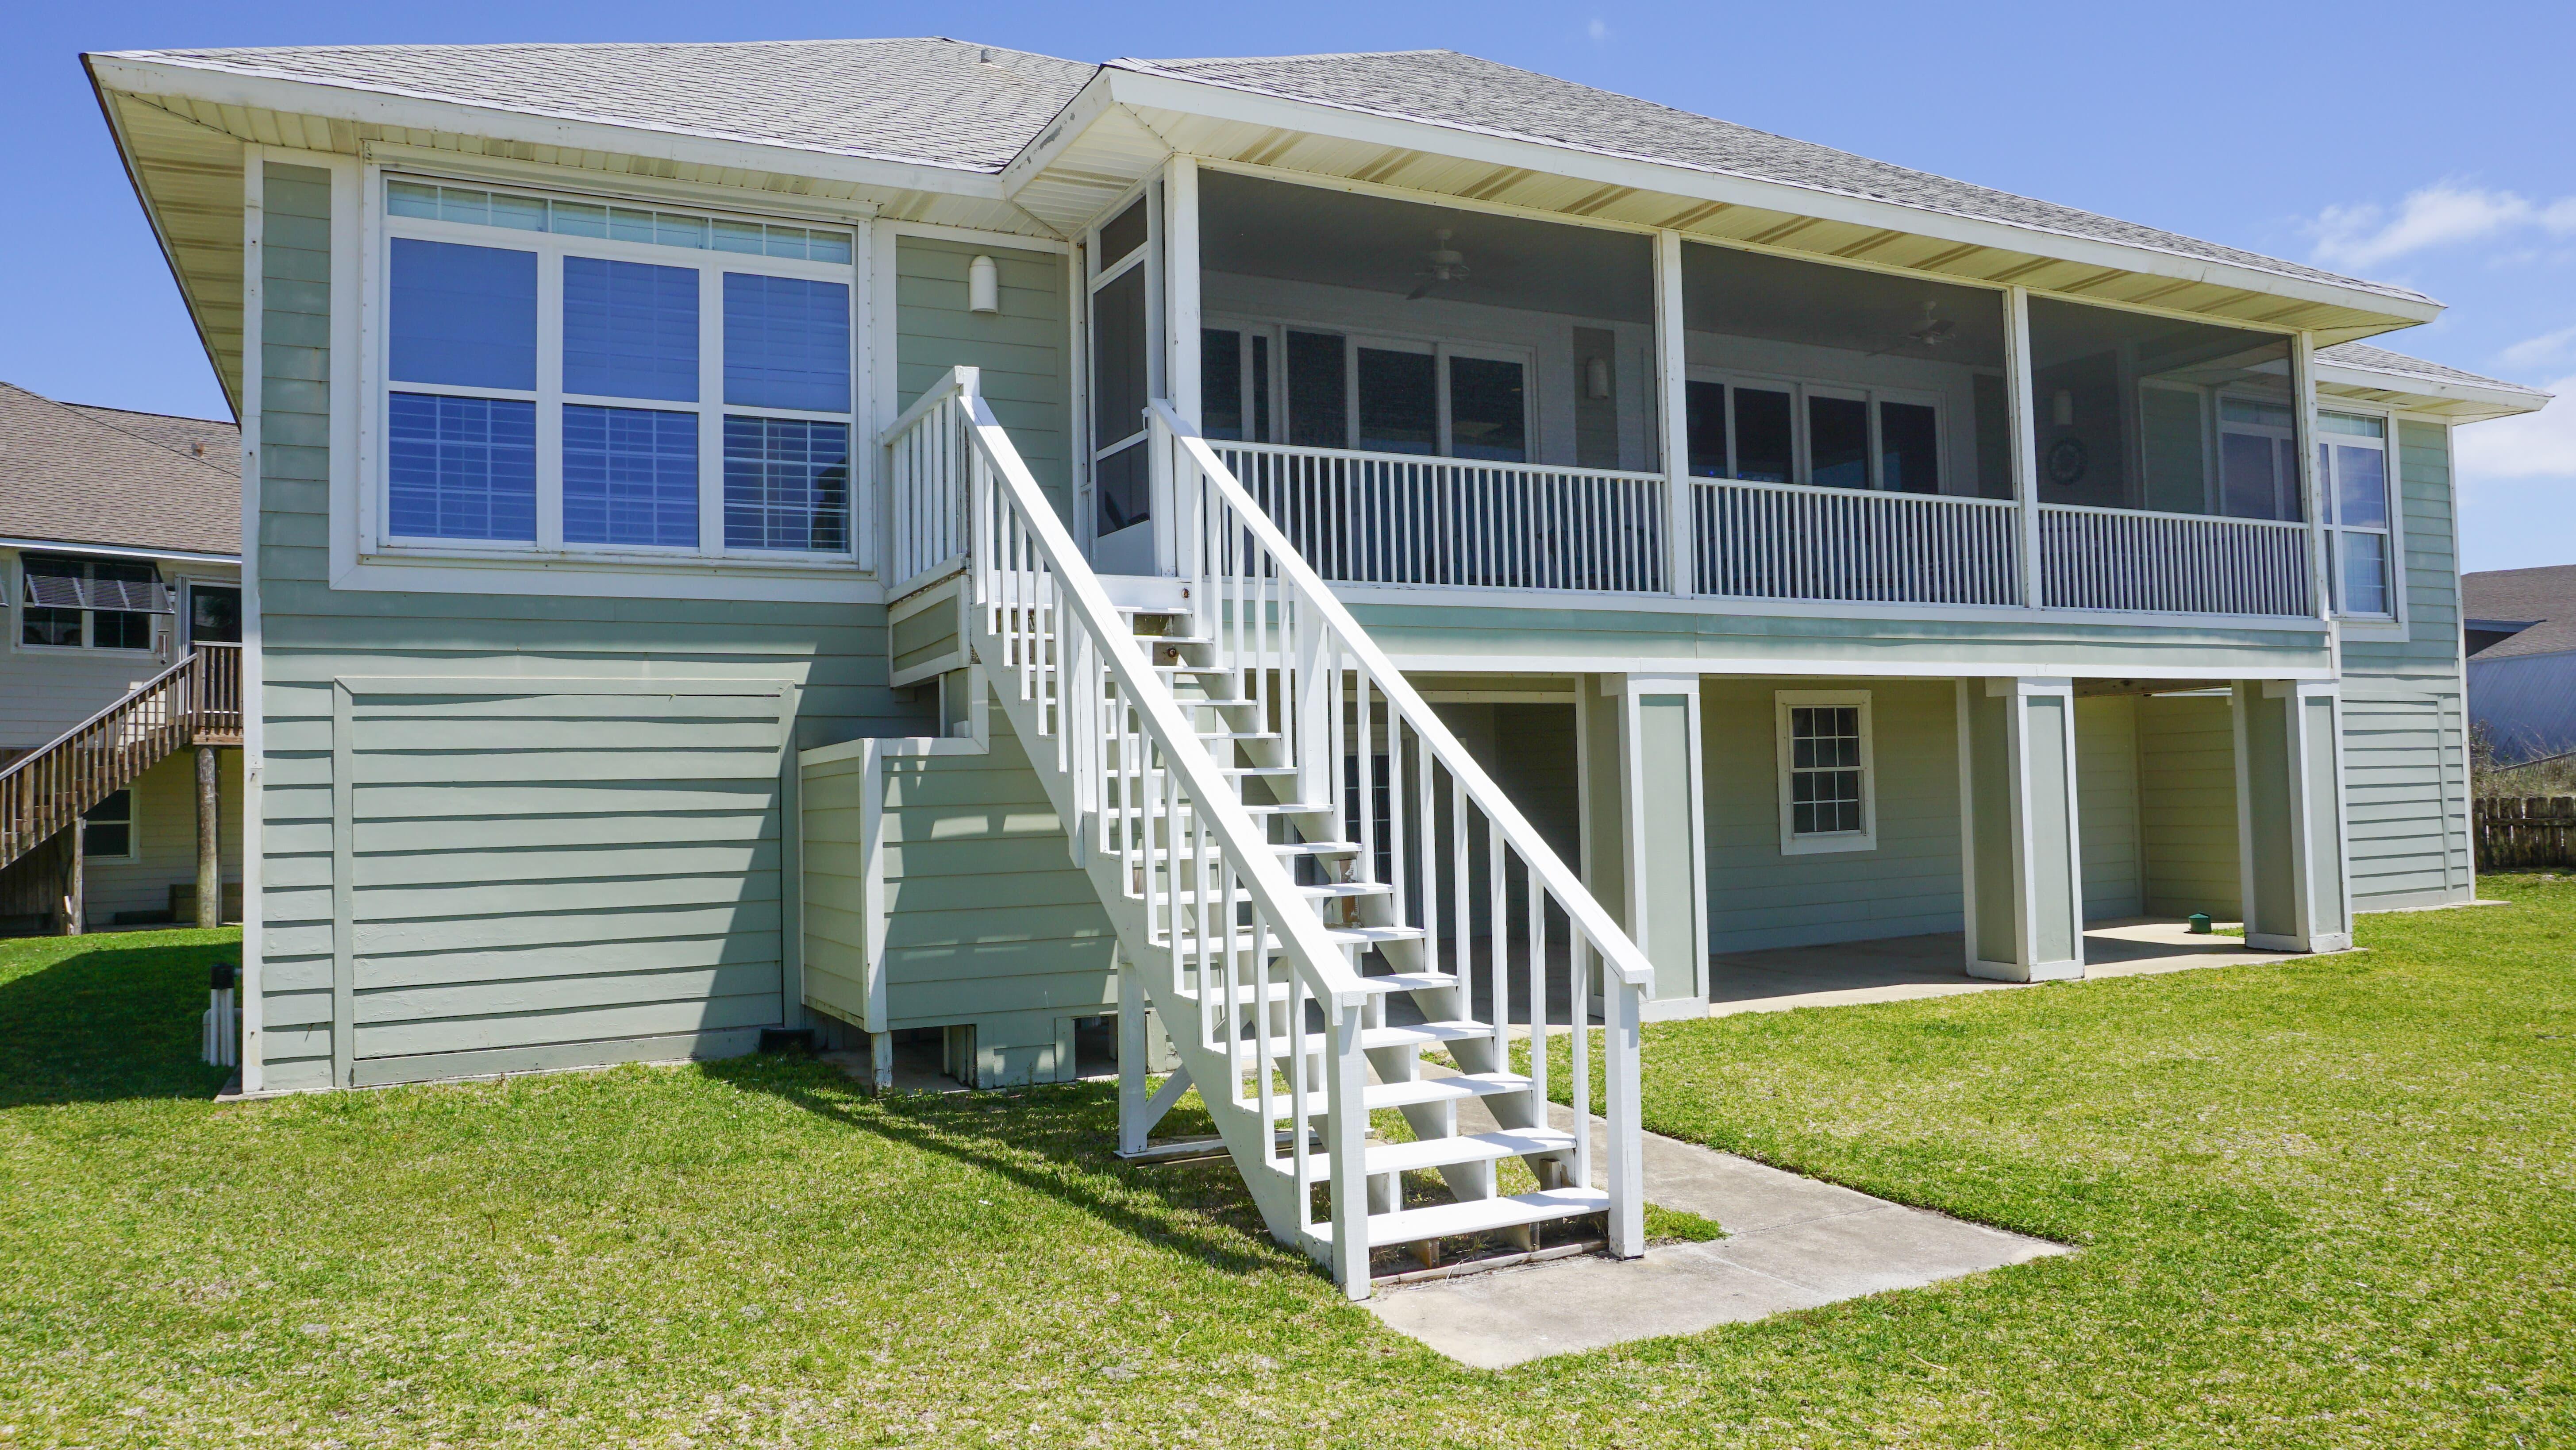 Ensenada Cinco 1730 House/Cottage rental in Pensacola Beach House Rentals in Pensacola Beach Florida - #40